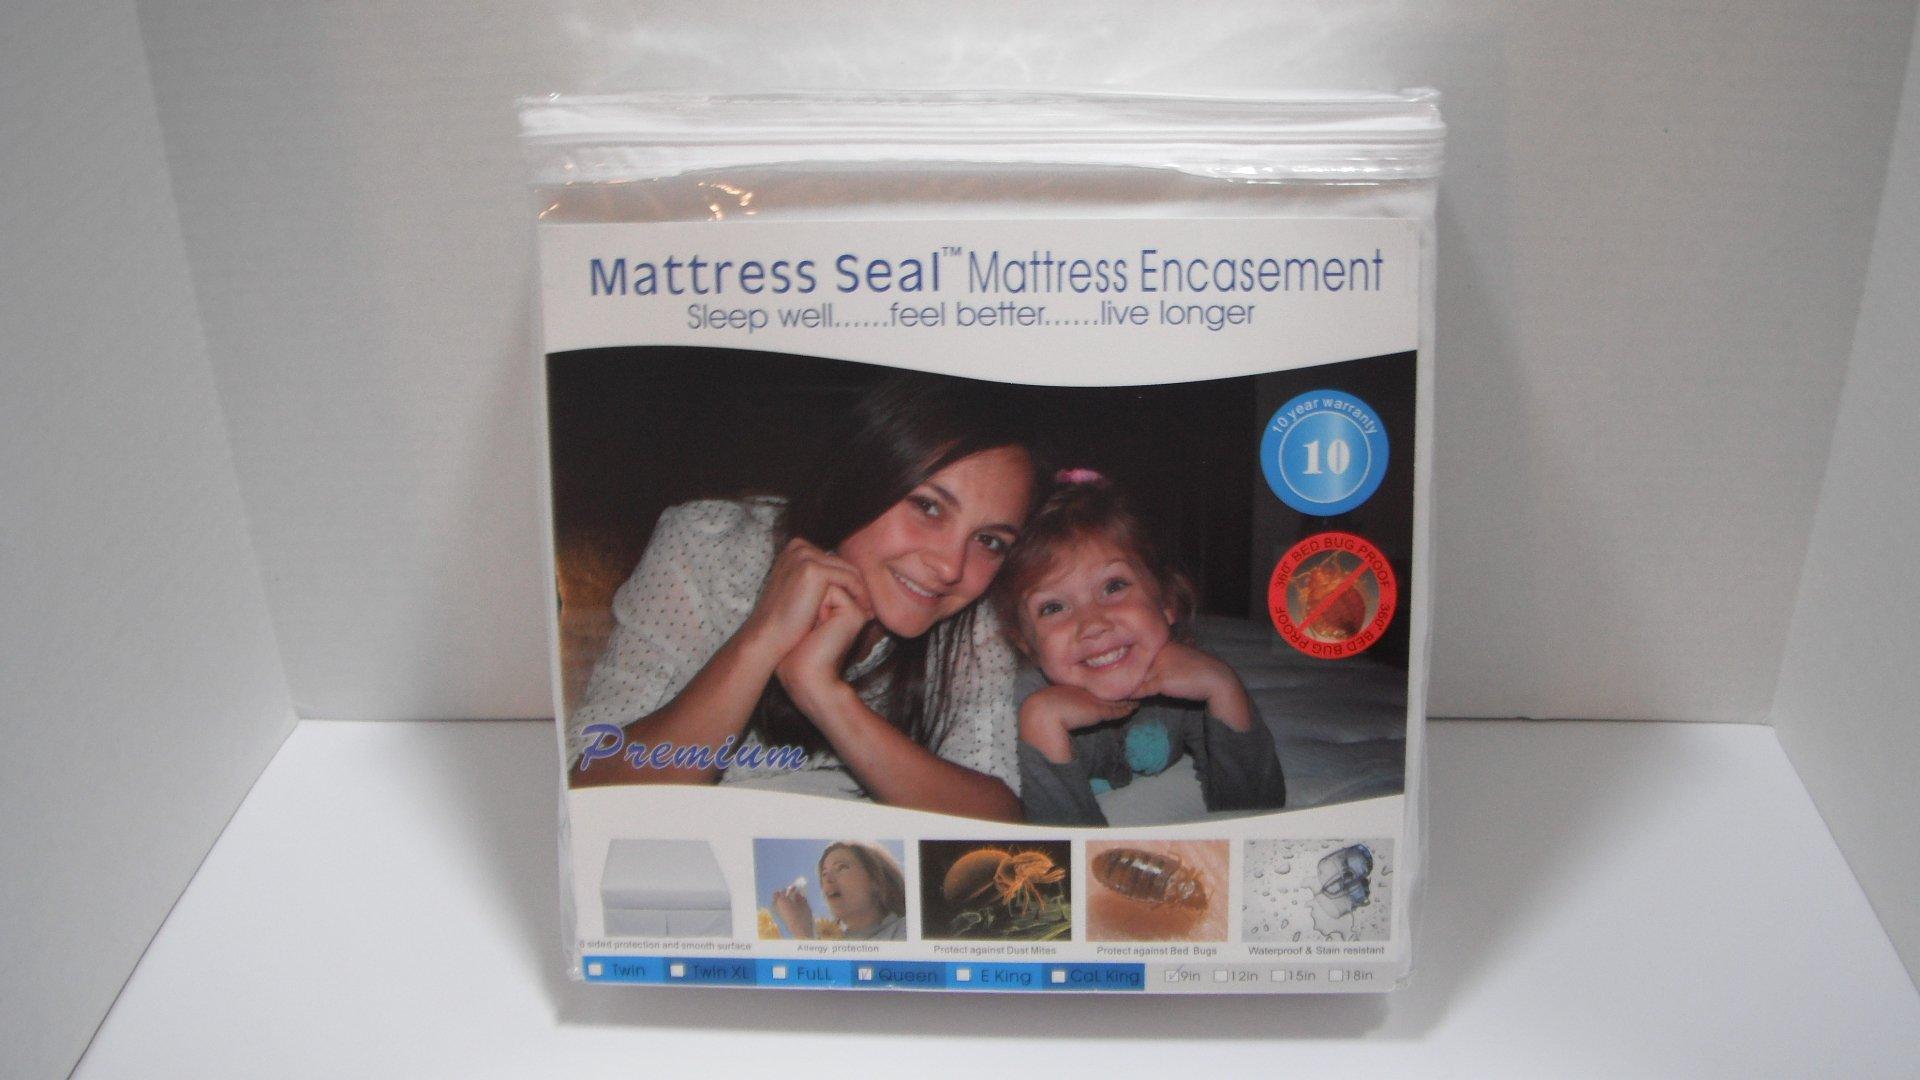 Mattress Seal(TM) Premium Mattress Encasement 9 inch, Twin XL